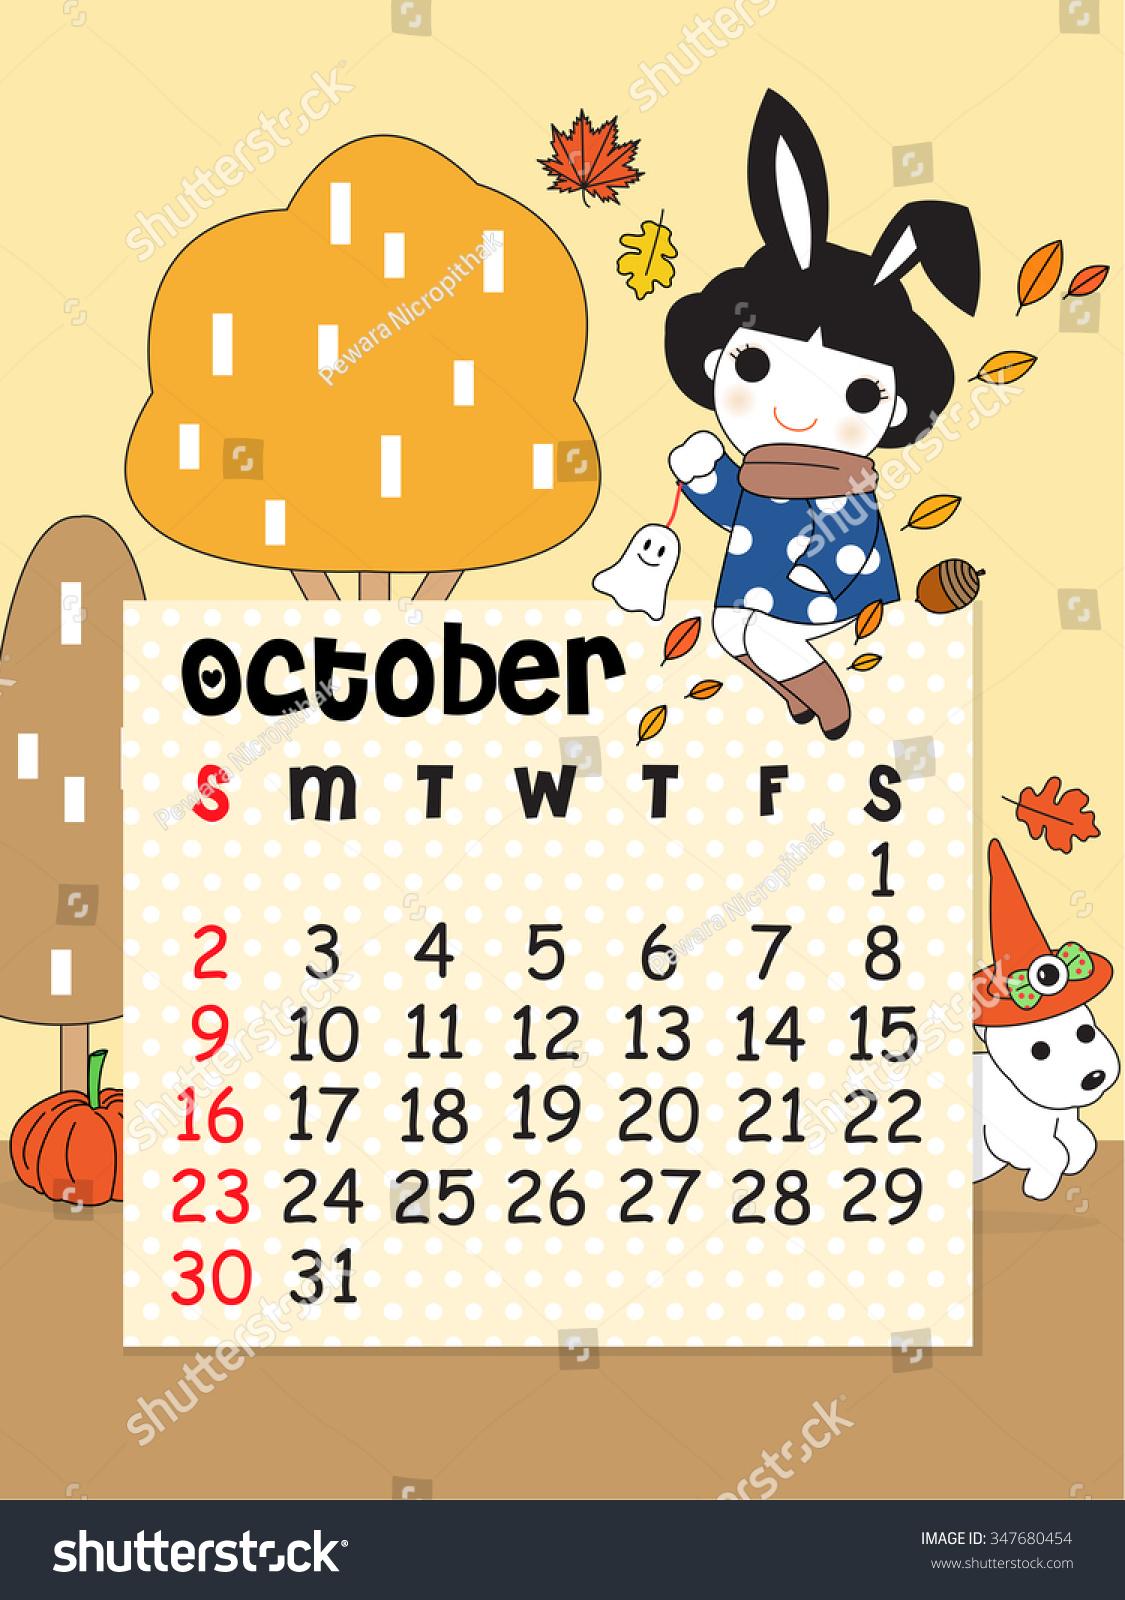 October Calendar Illustration : October calendar template cute character illustration